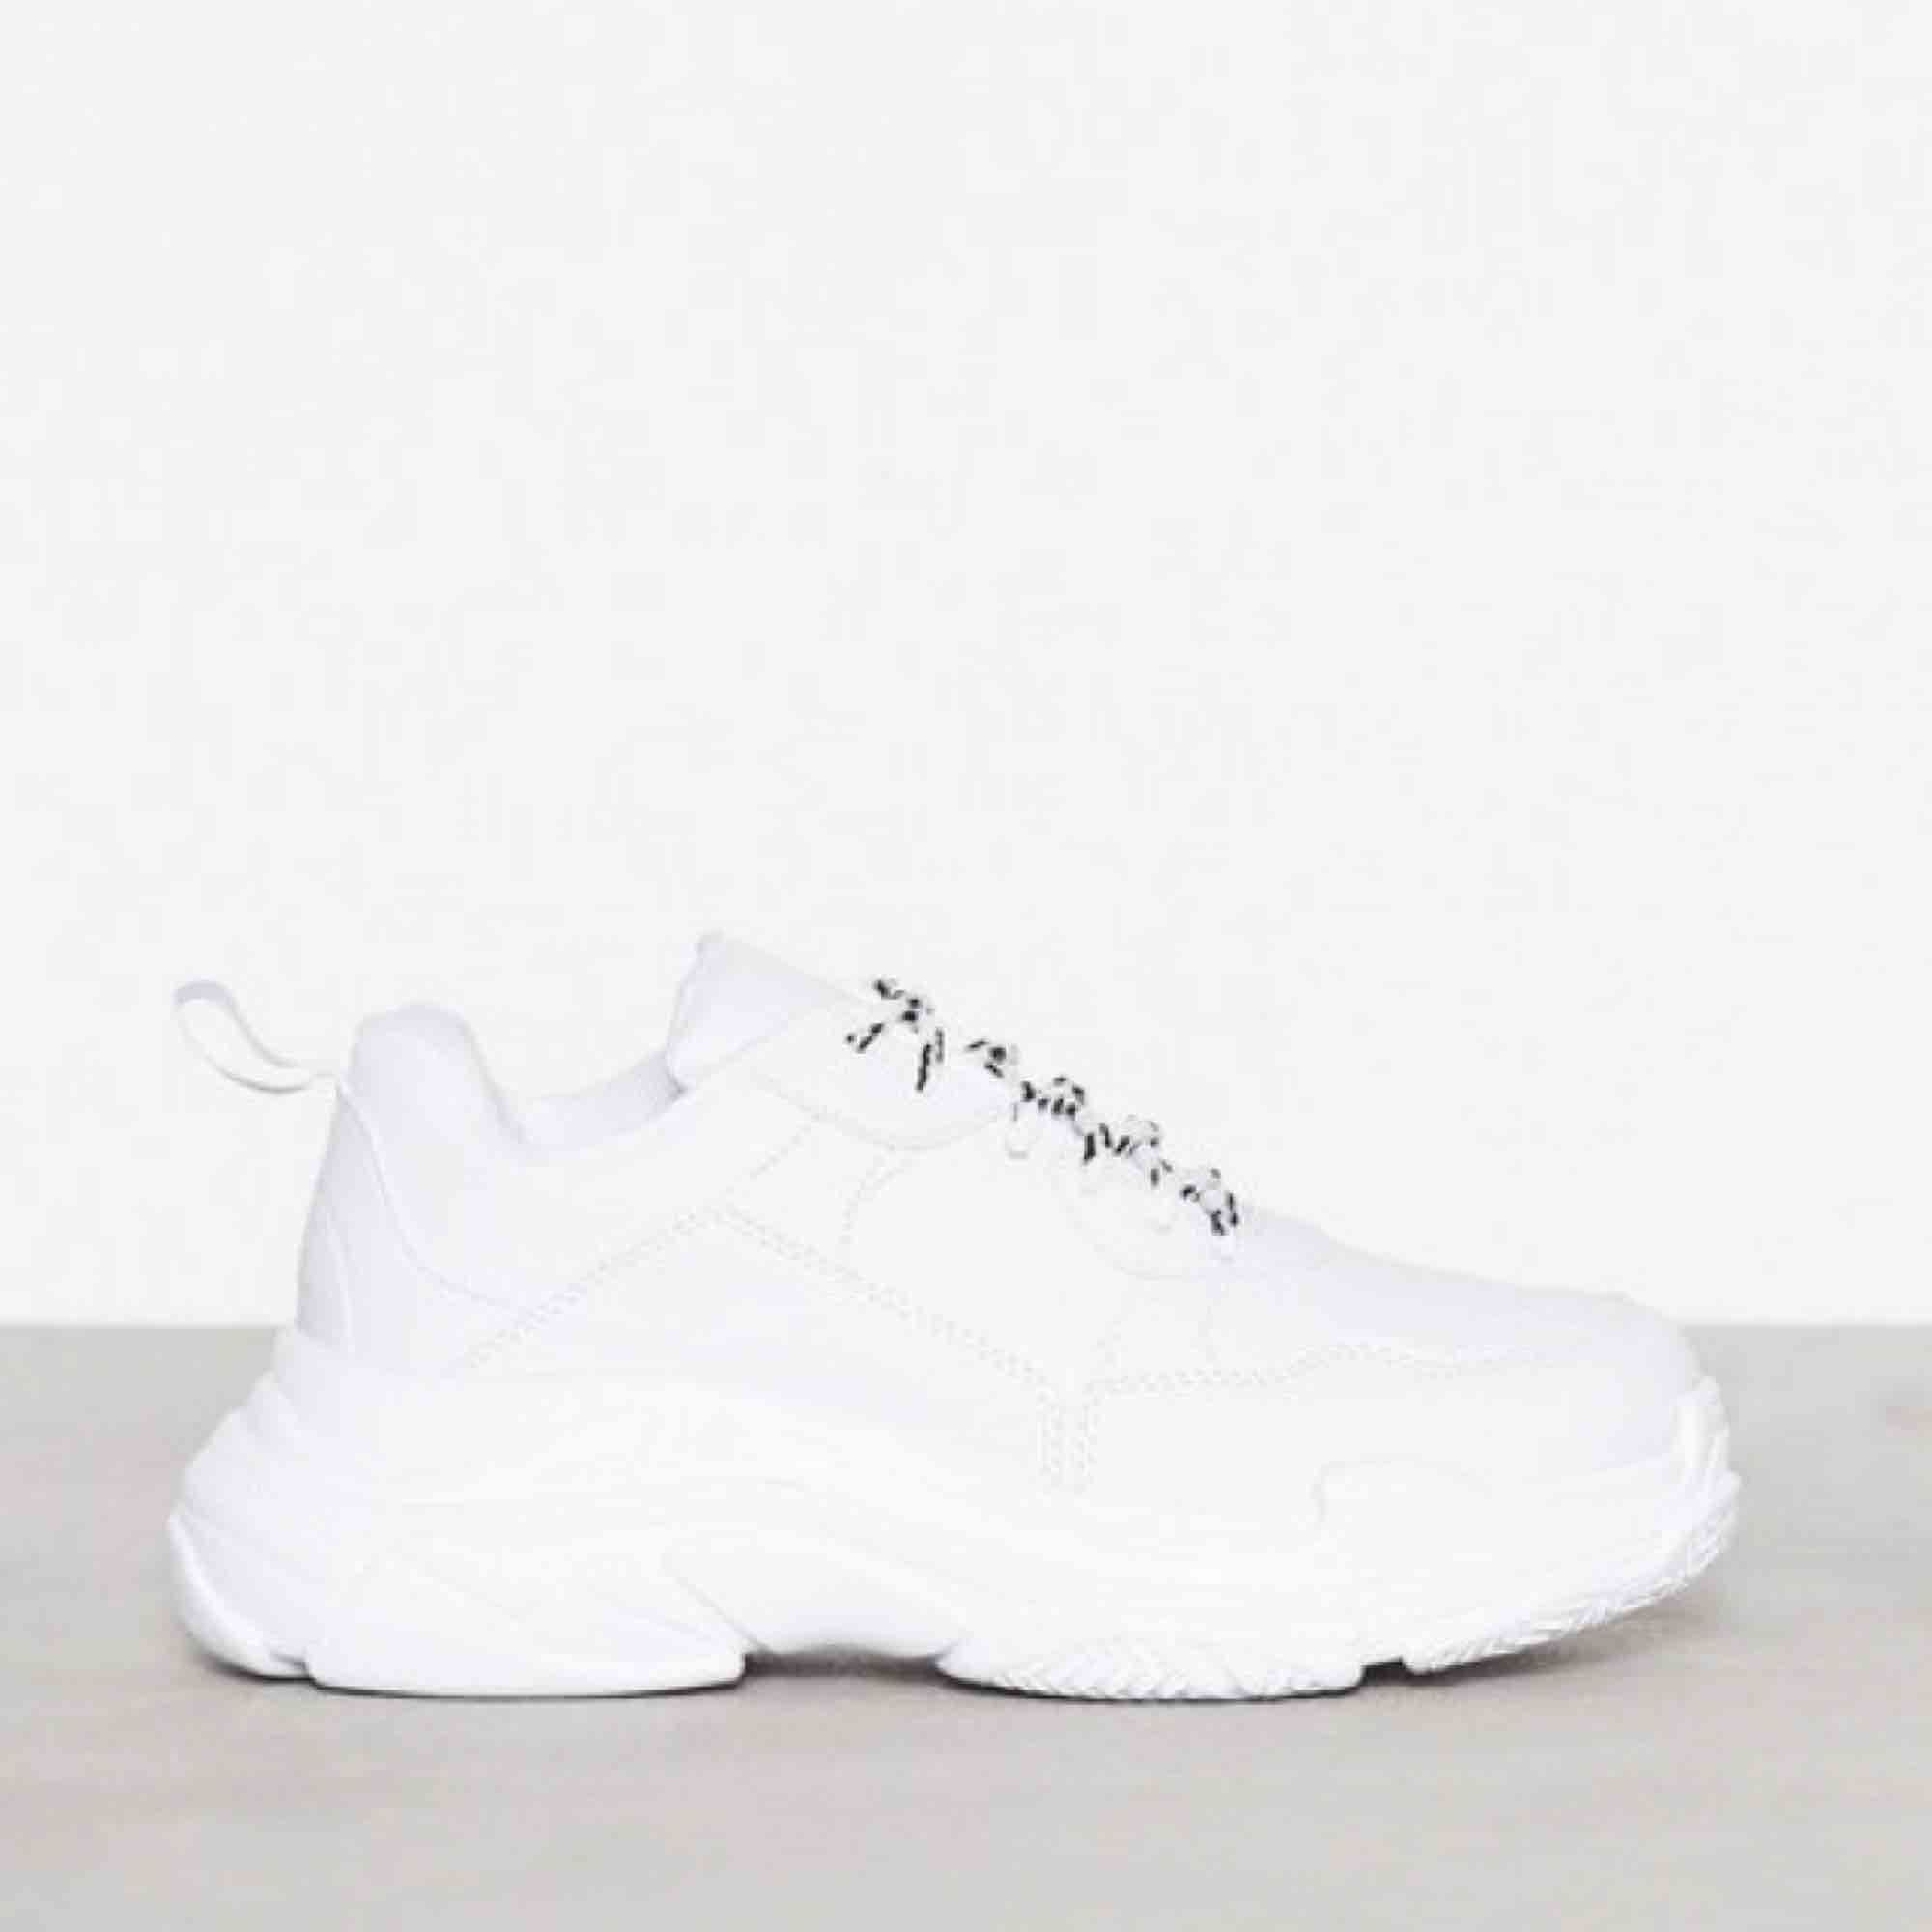 b48055fd78d Chunky Sneakers, Nelly. Vita platåsneakers i läderimitation från NLY Shoes.